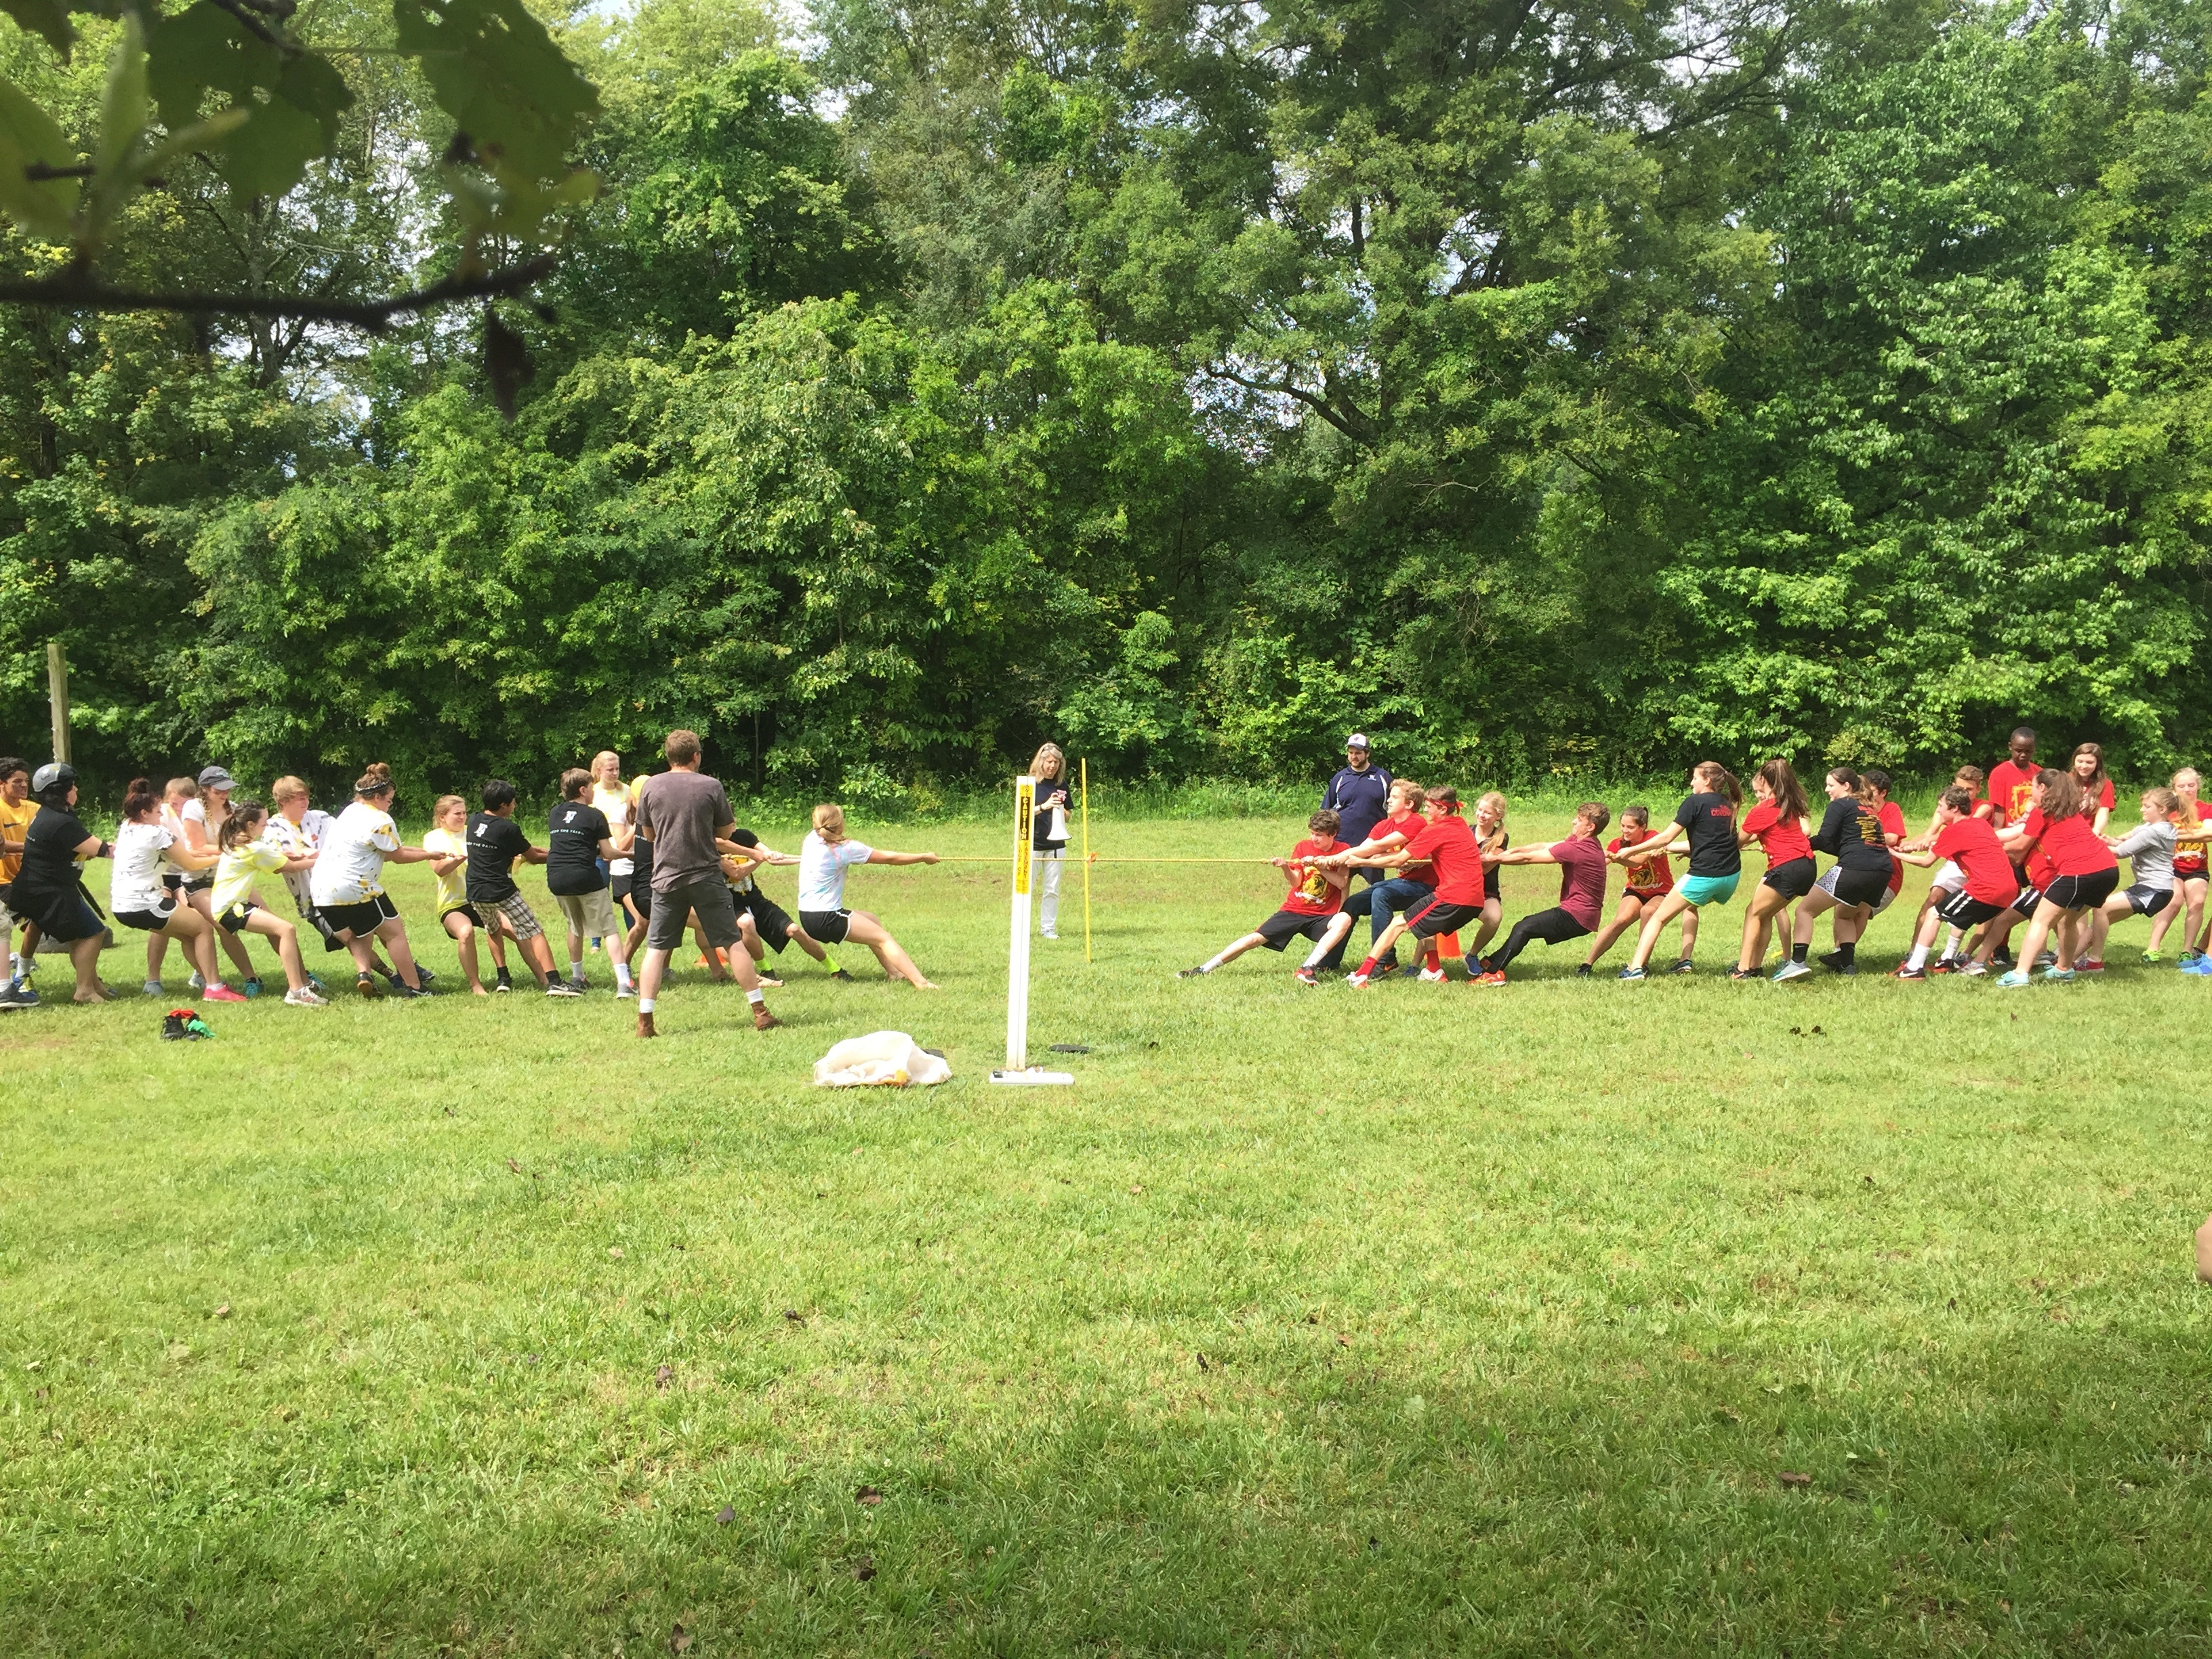 athletes and teamwork